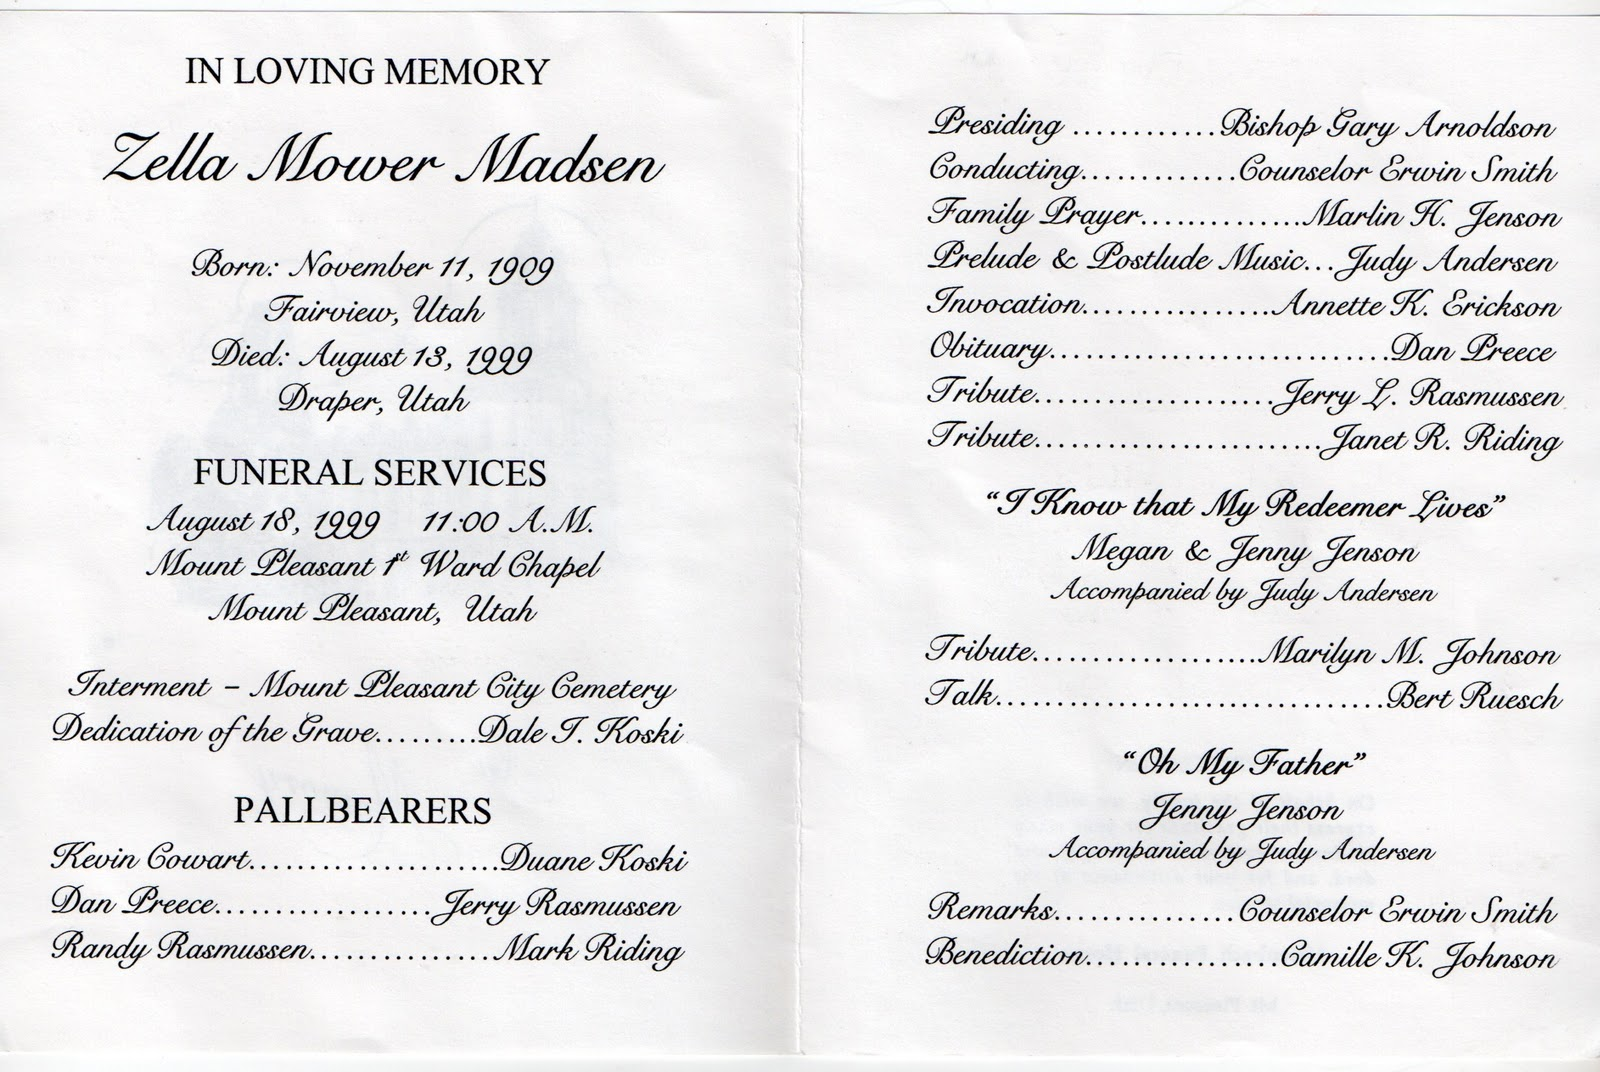 Sample Funeral Program Template funeral program template sample – Funeral Program Samples